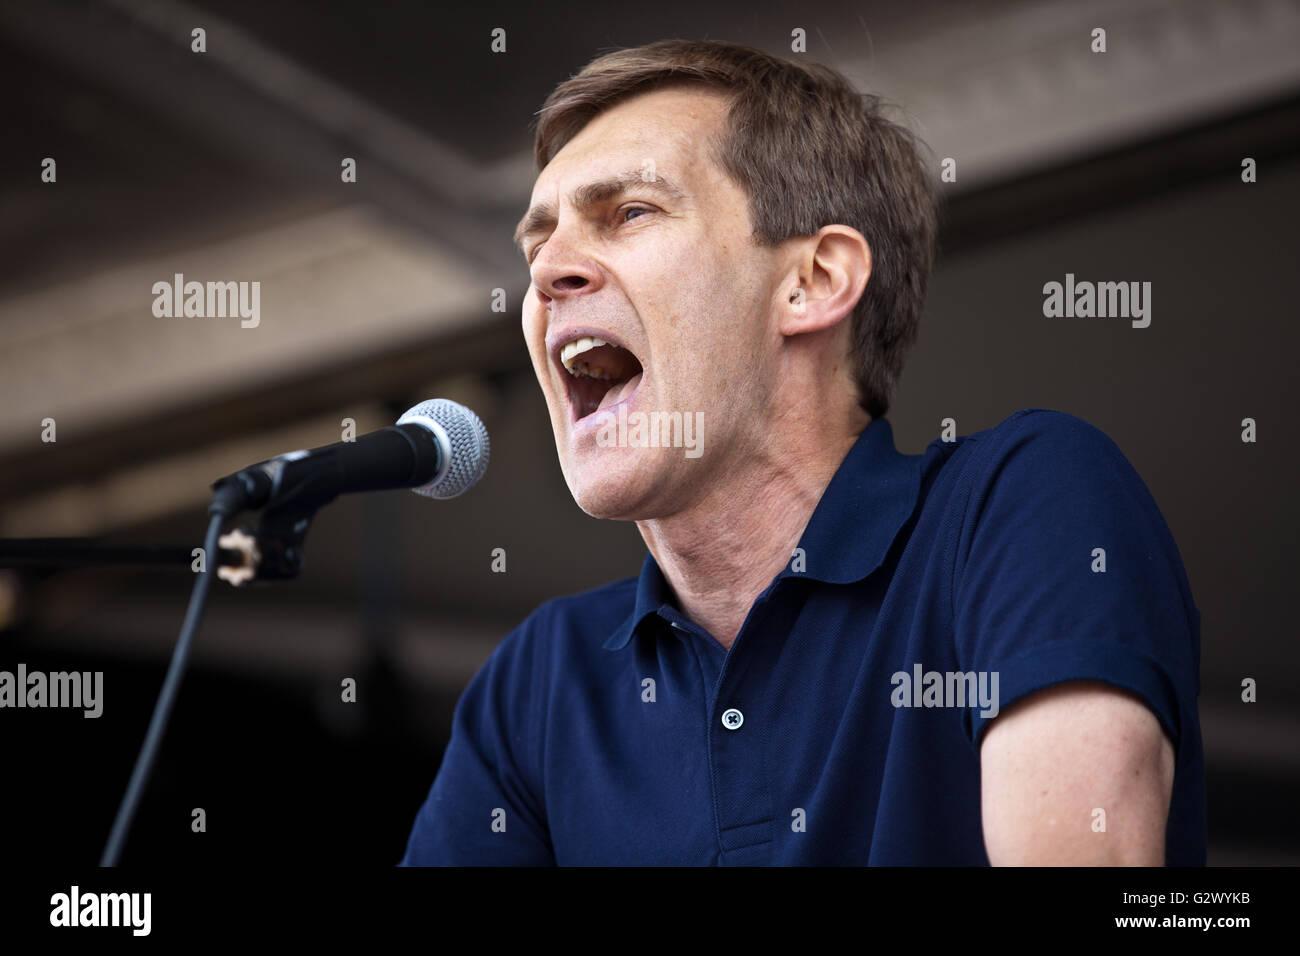 London, UK. 9th August, 2014. Seumas Milne, journalist and writer, addresses the National Demonstration for Gaza - Stock Image